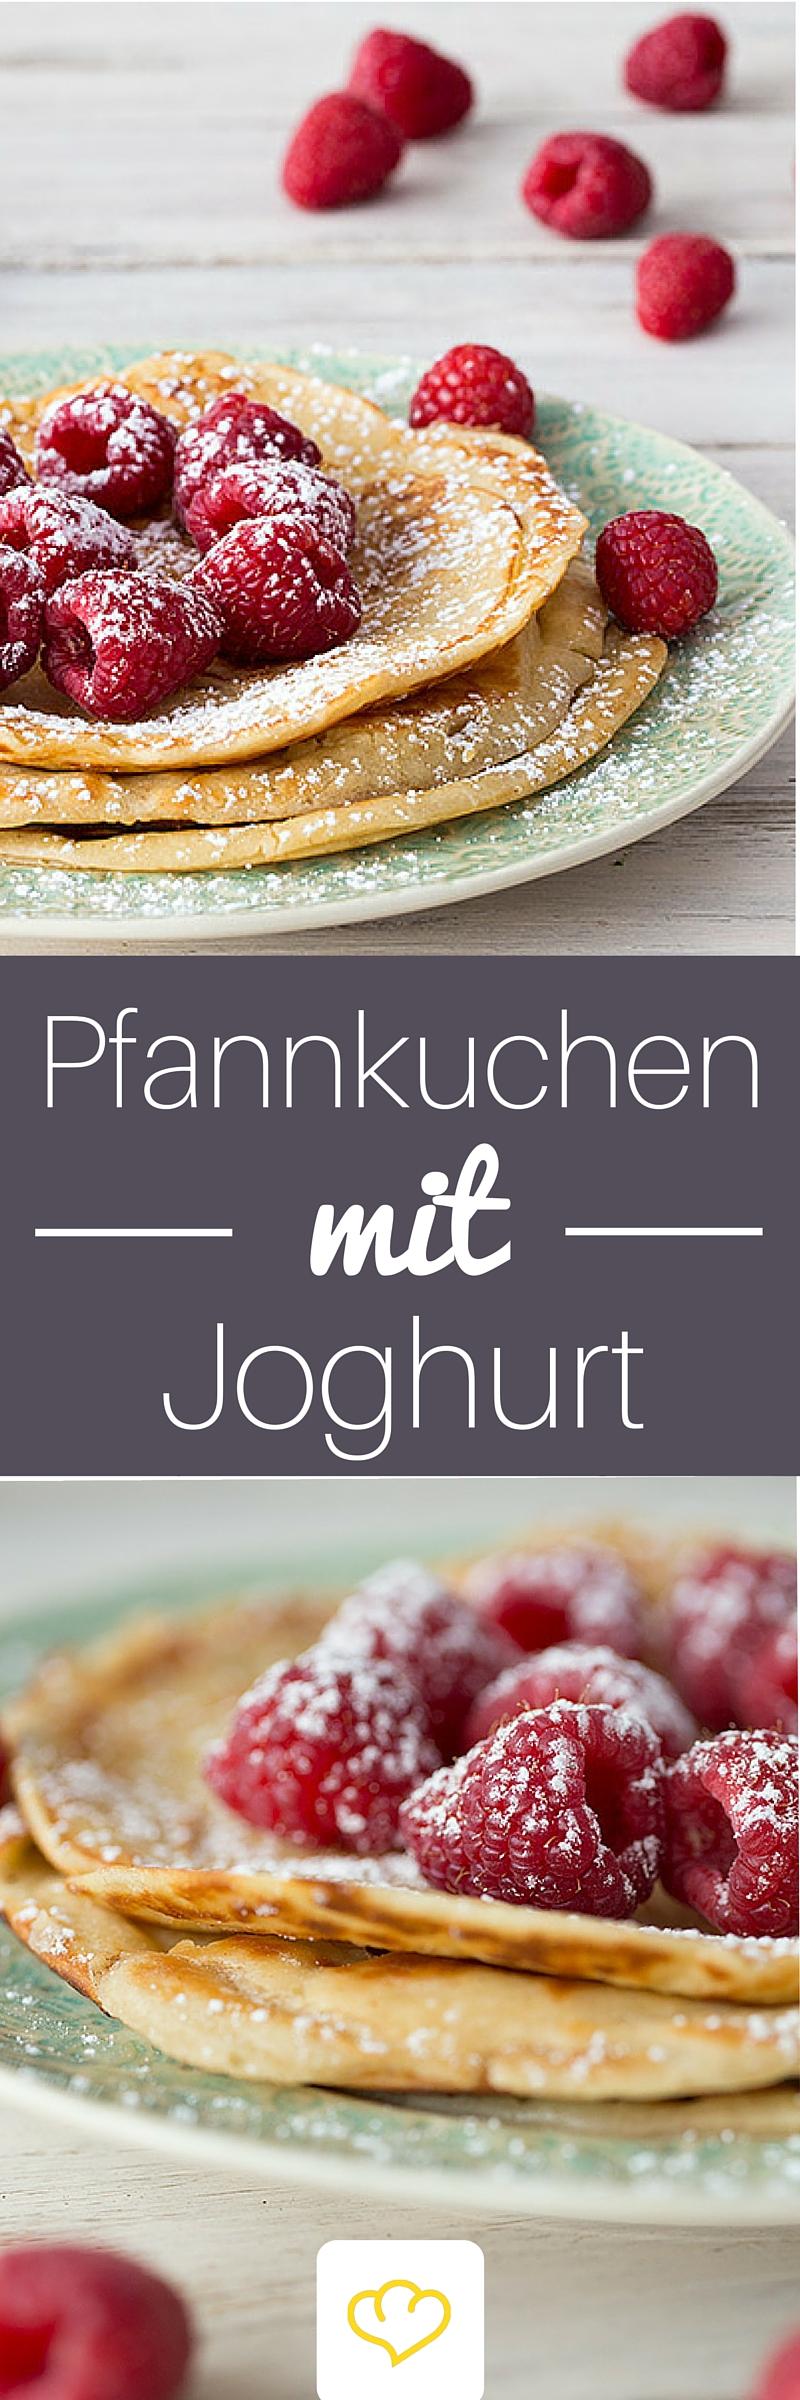 joghurt pfannkuchen mit himbeeren rezept delicious maxis und simones. Black Bedroom Furniture Sets. Home Design Ideas